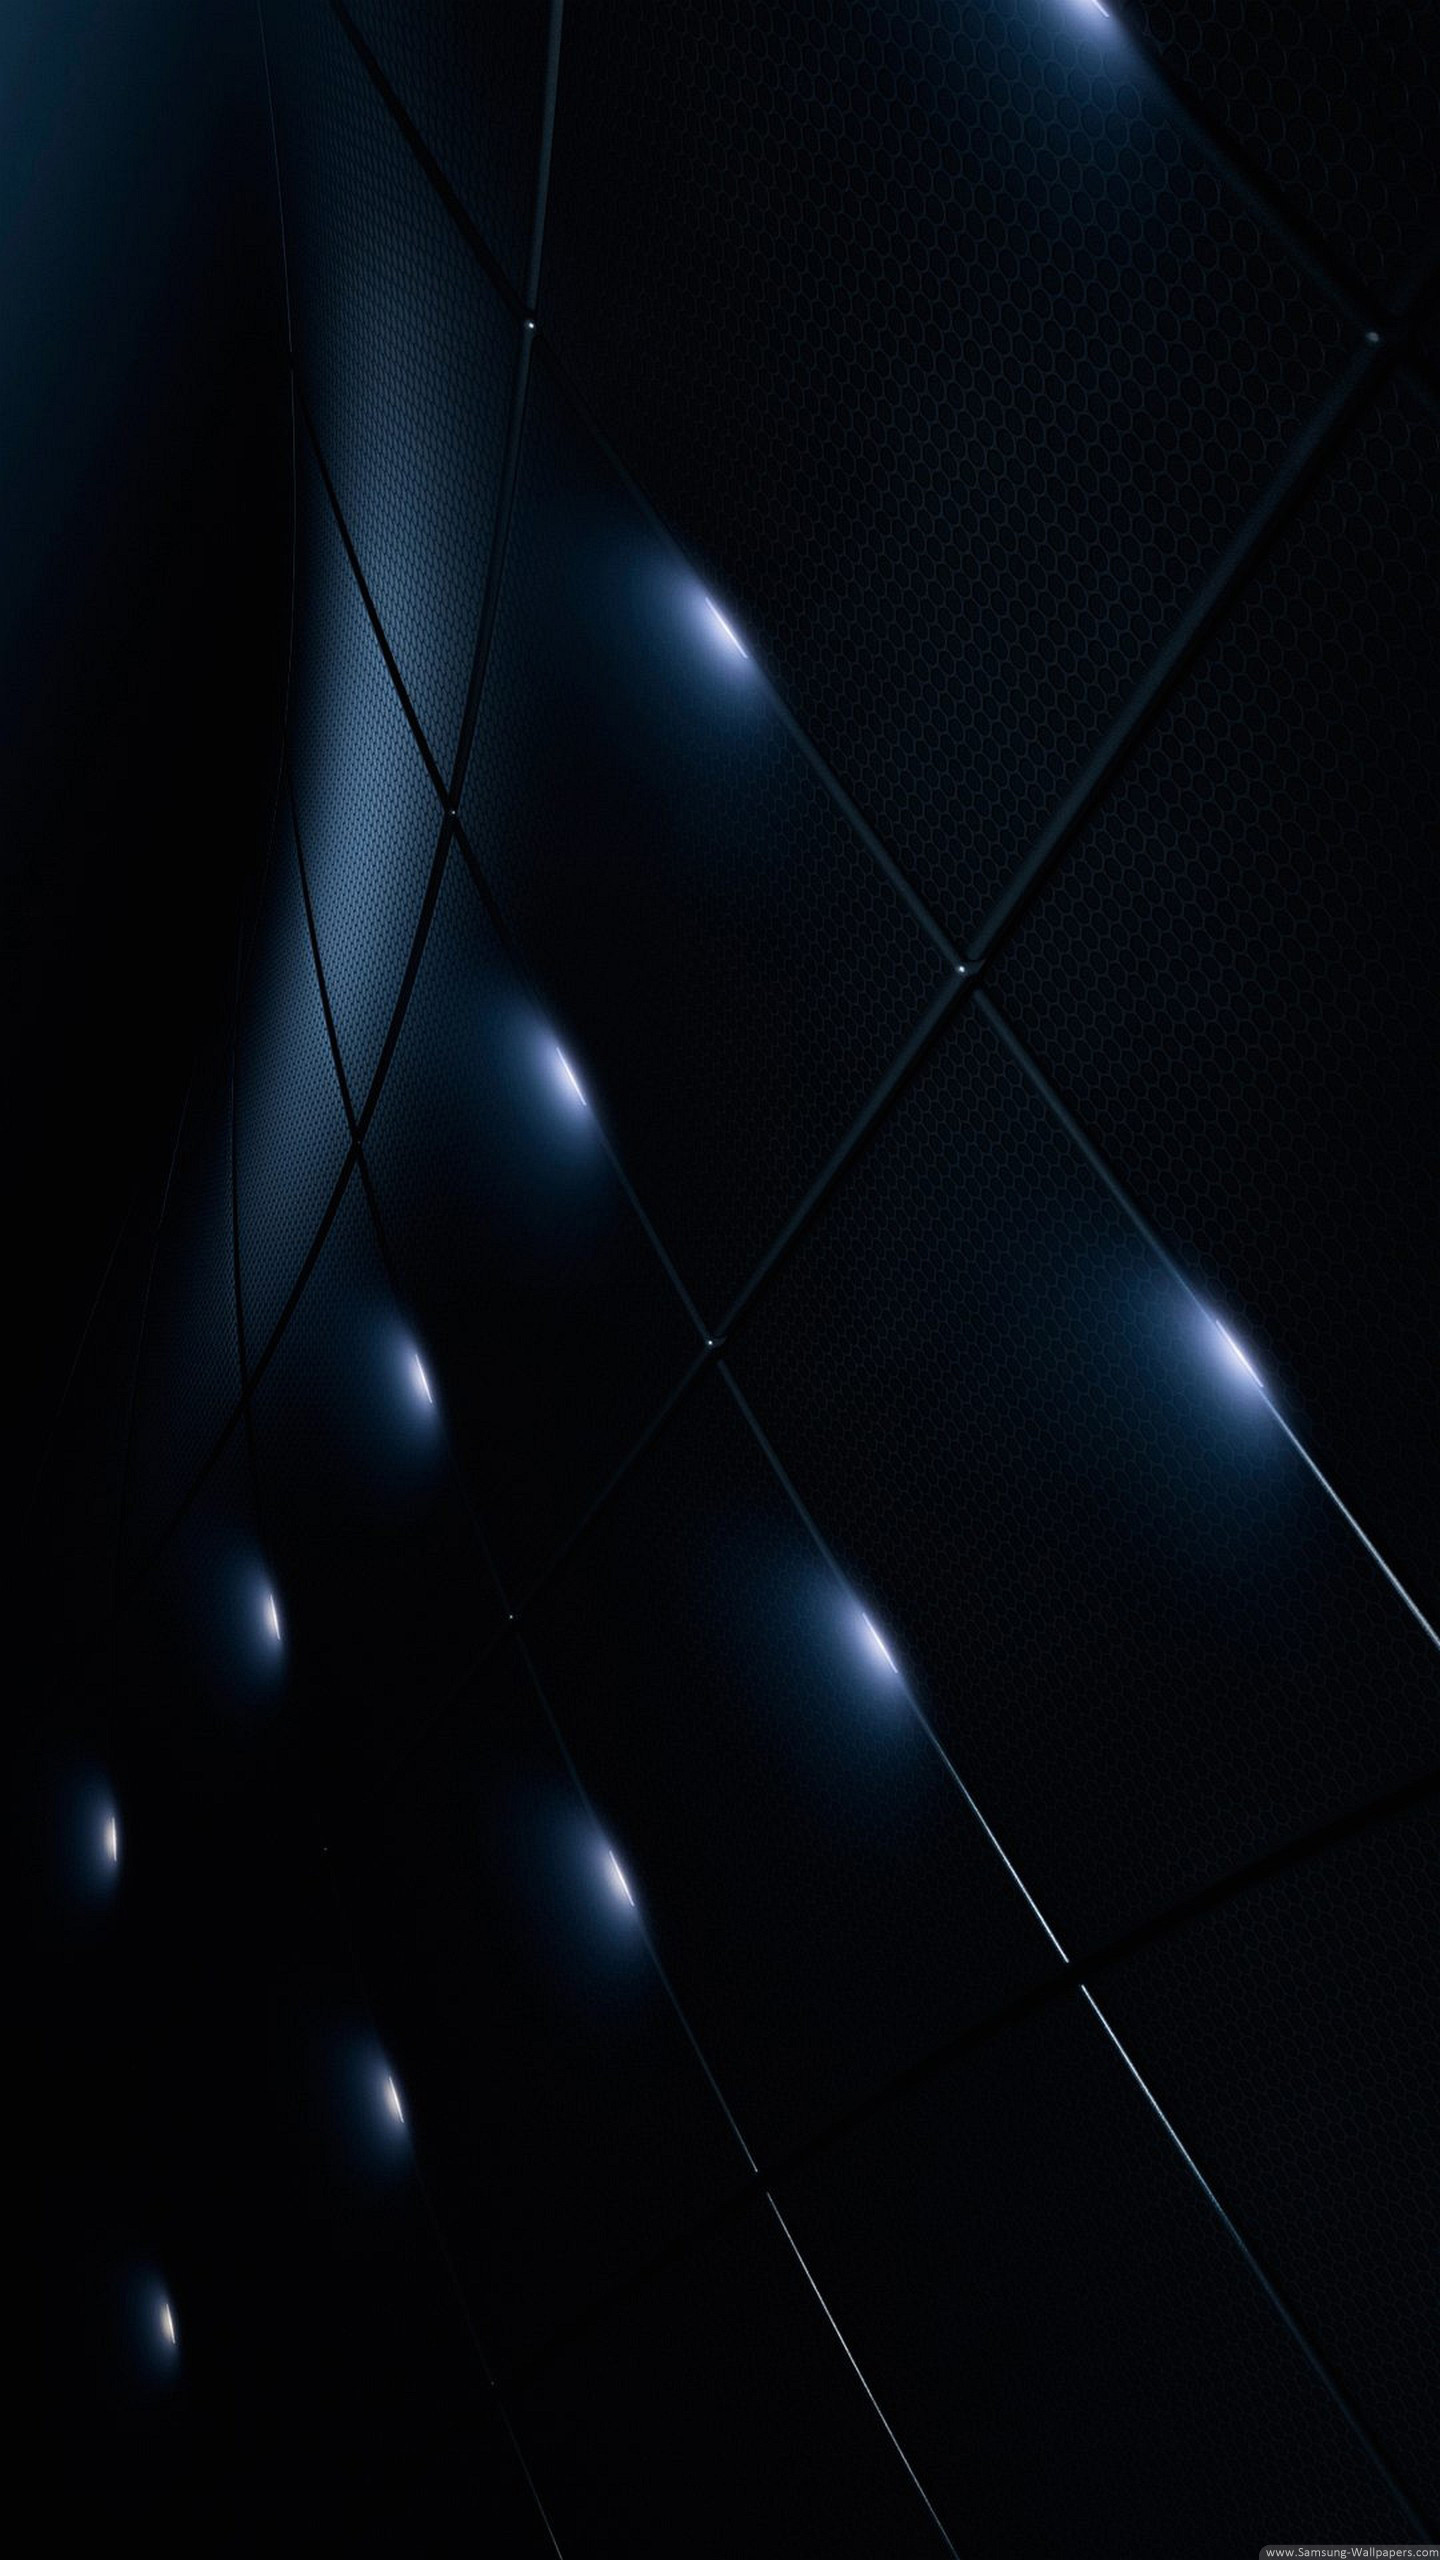 Samsung Galaxy S5 Black Wallpaper 88 Images